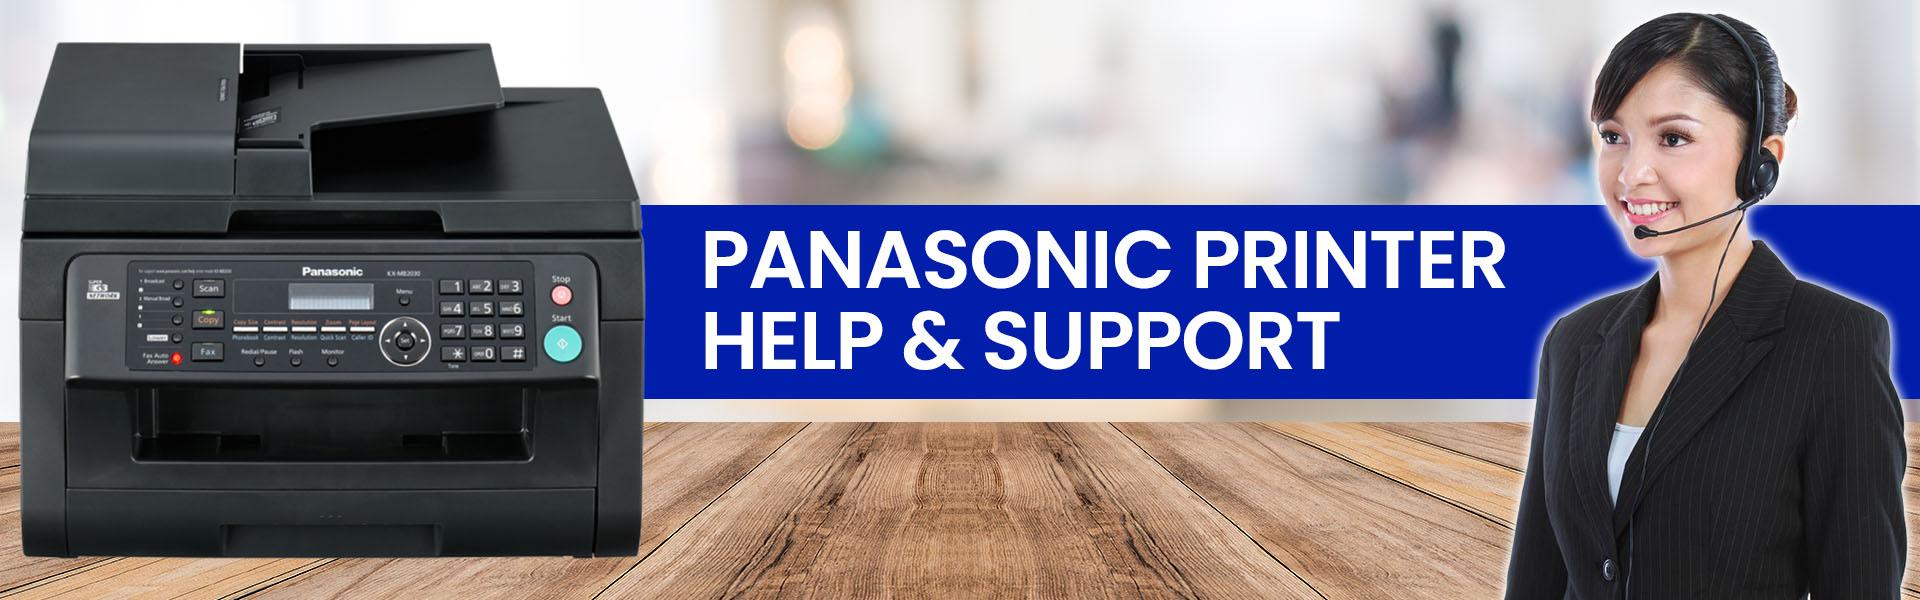 panasonic printer help support